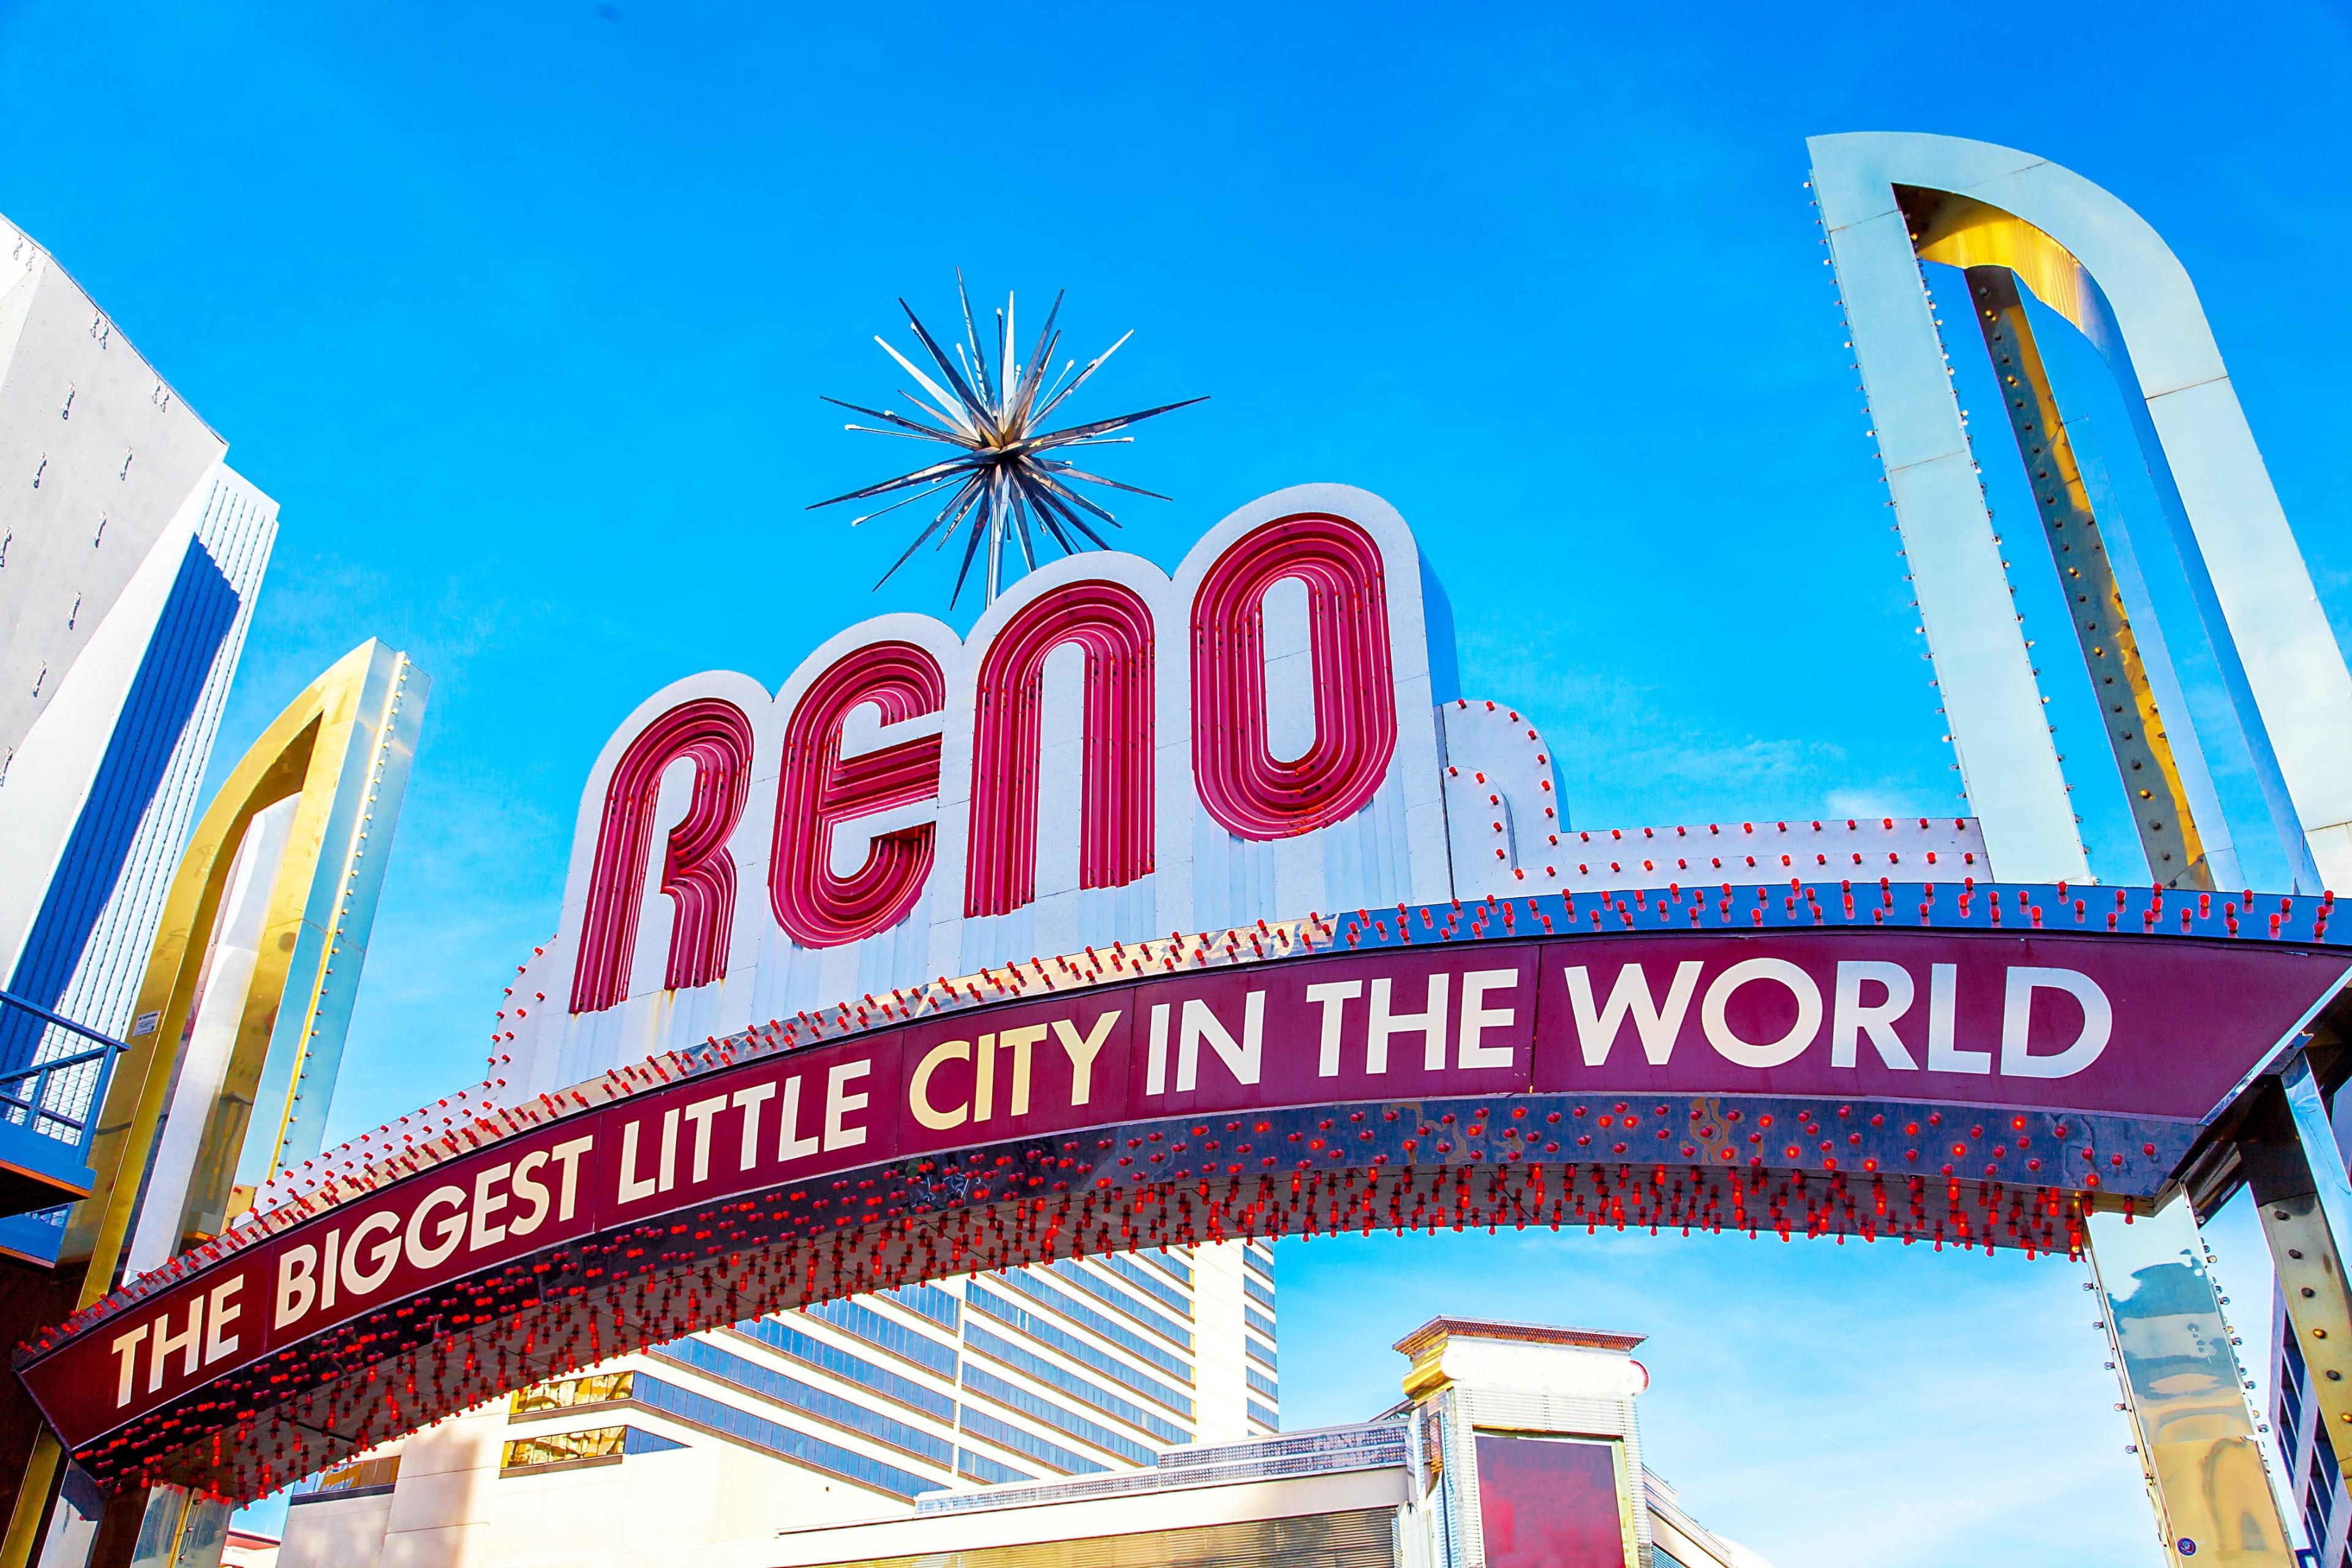 Reno-Sparks Convention Center, Reno, Nevada, United States of America